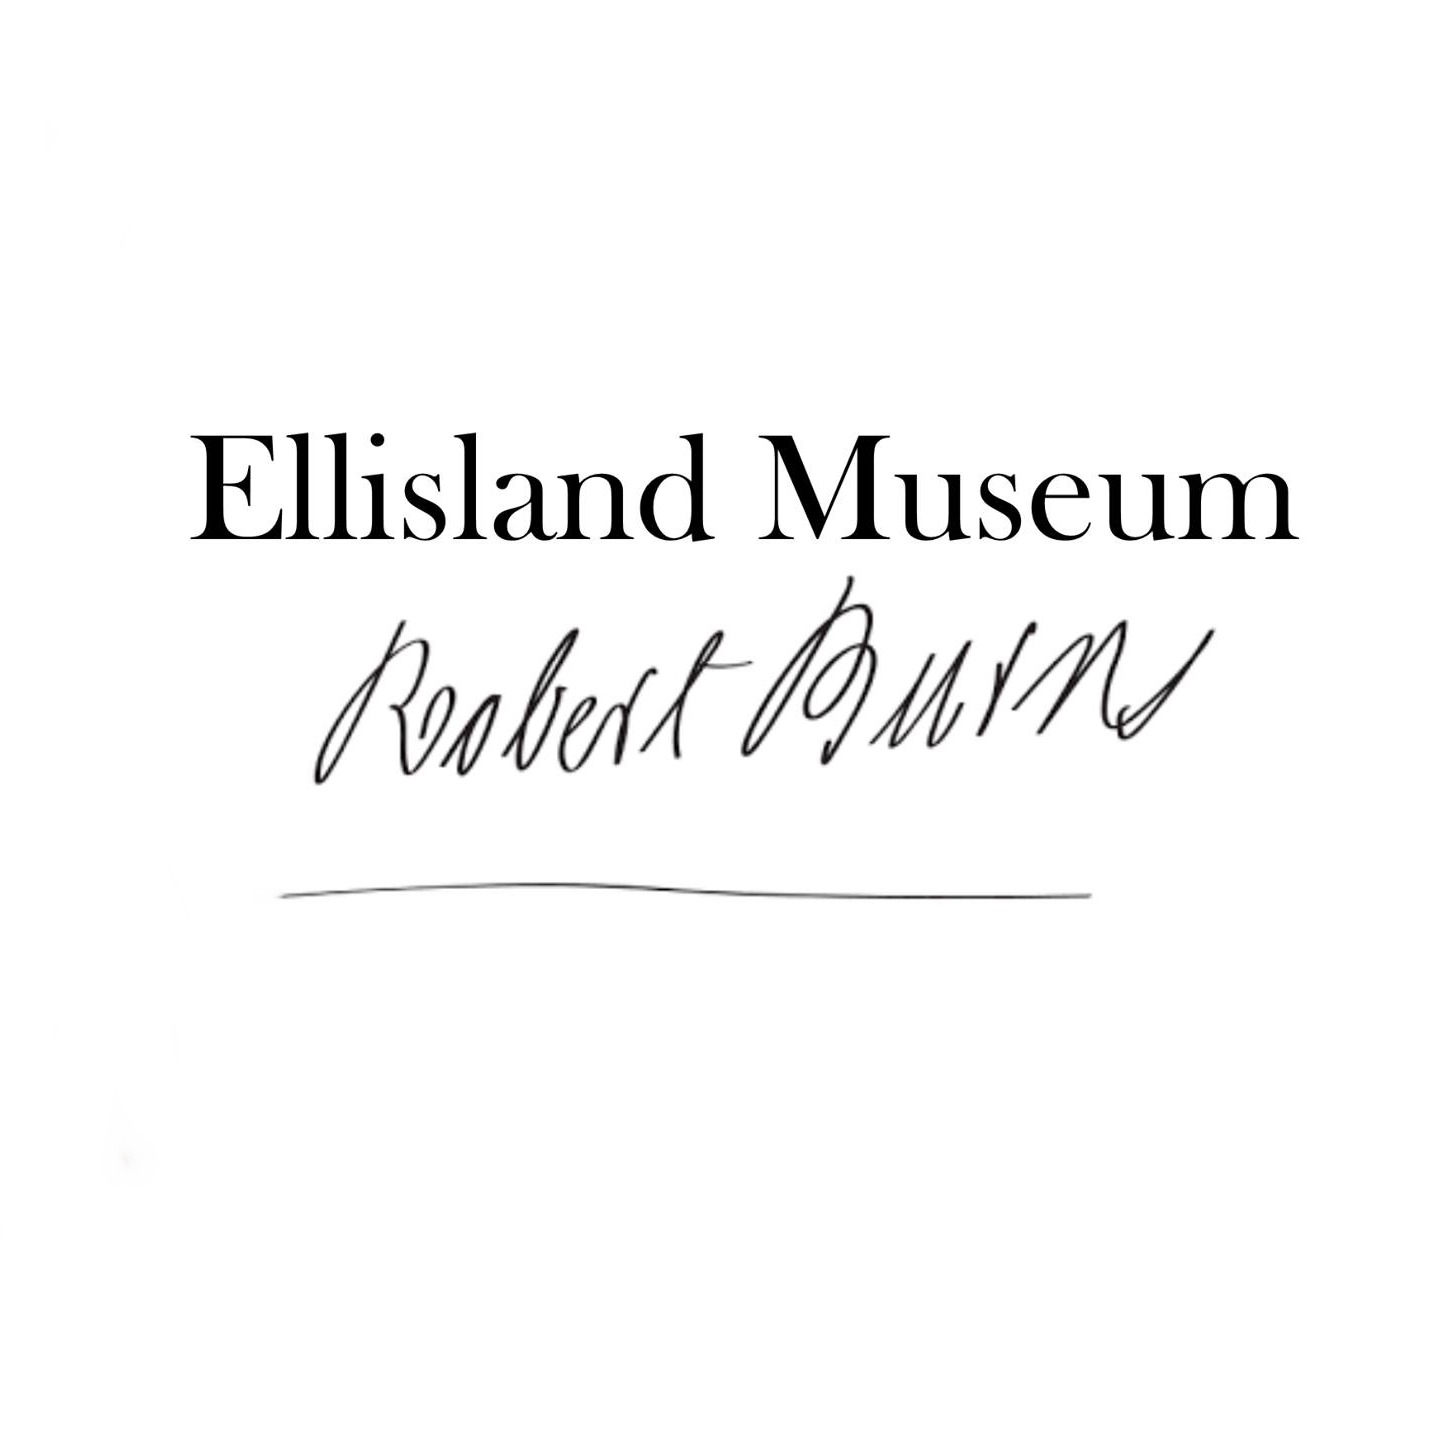 Ellisland